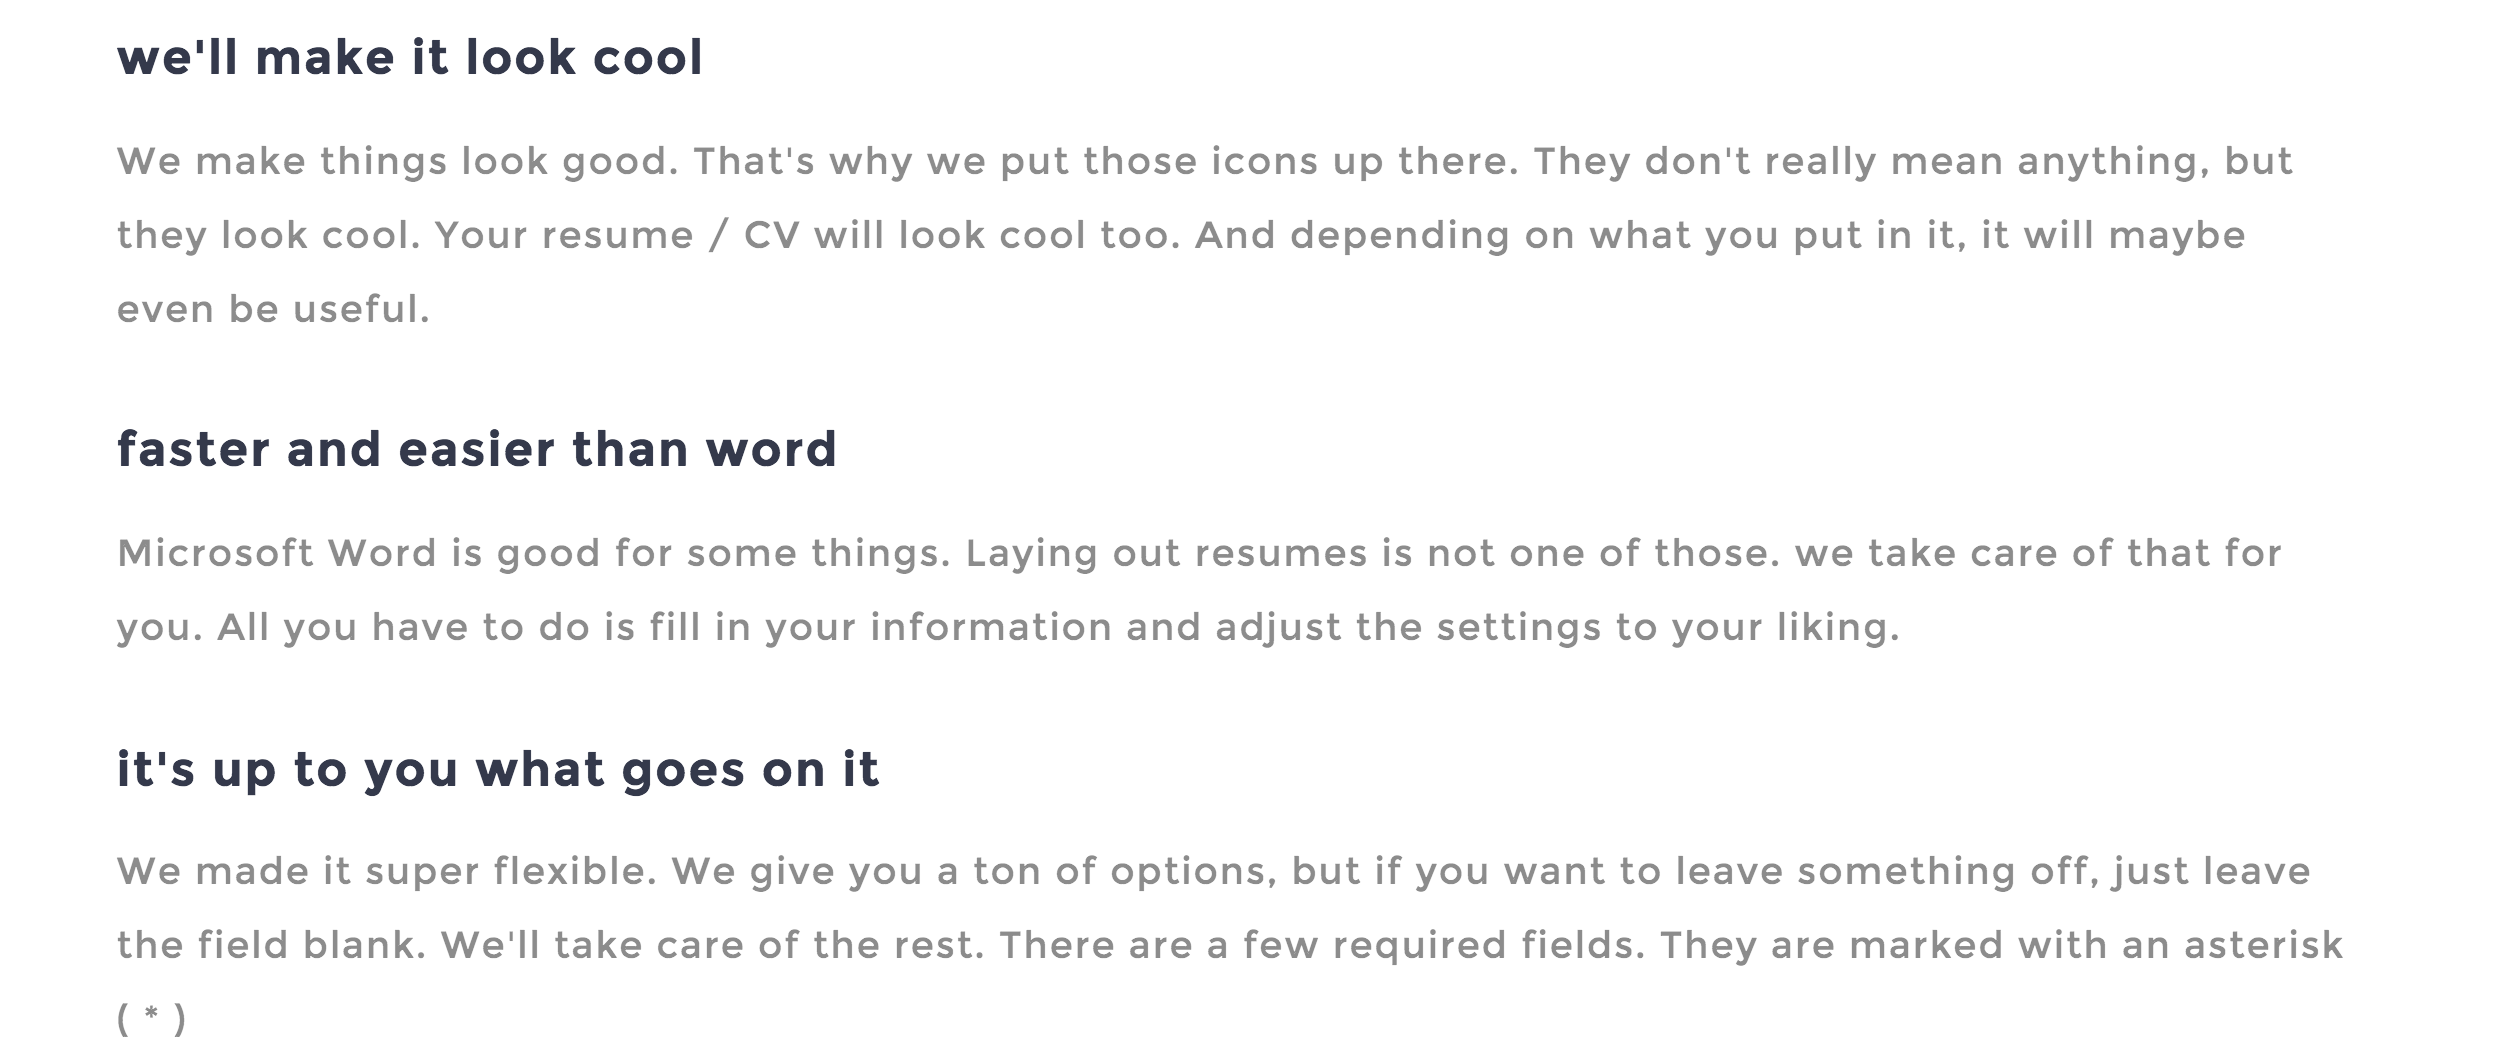 need a resume